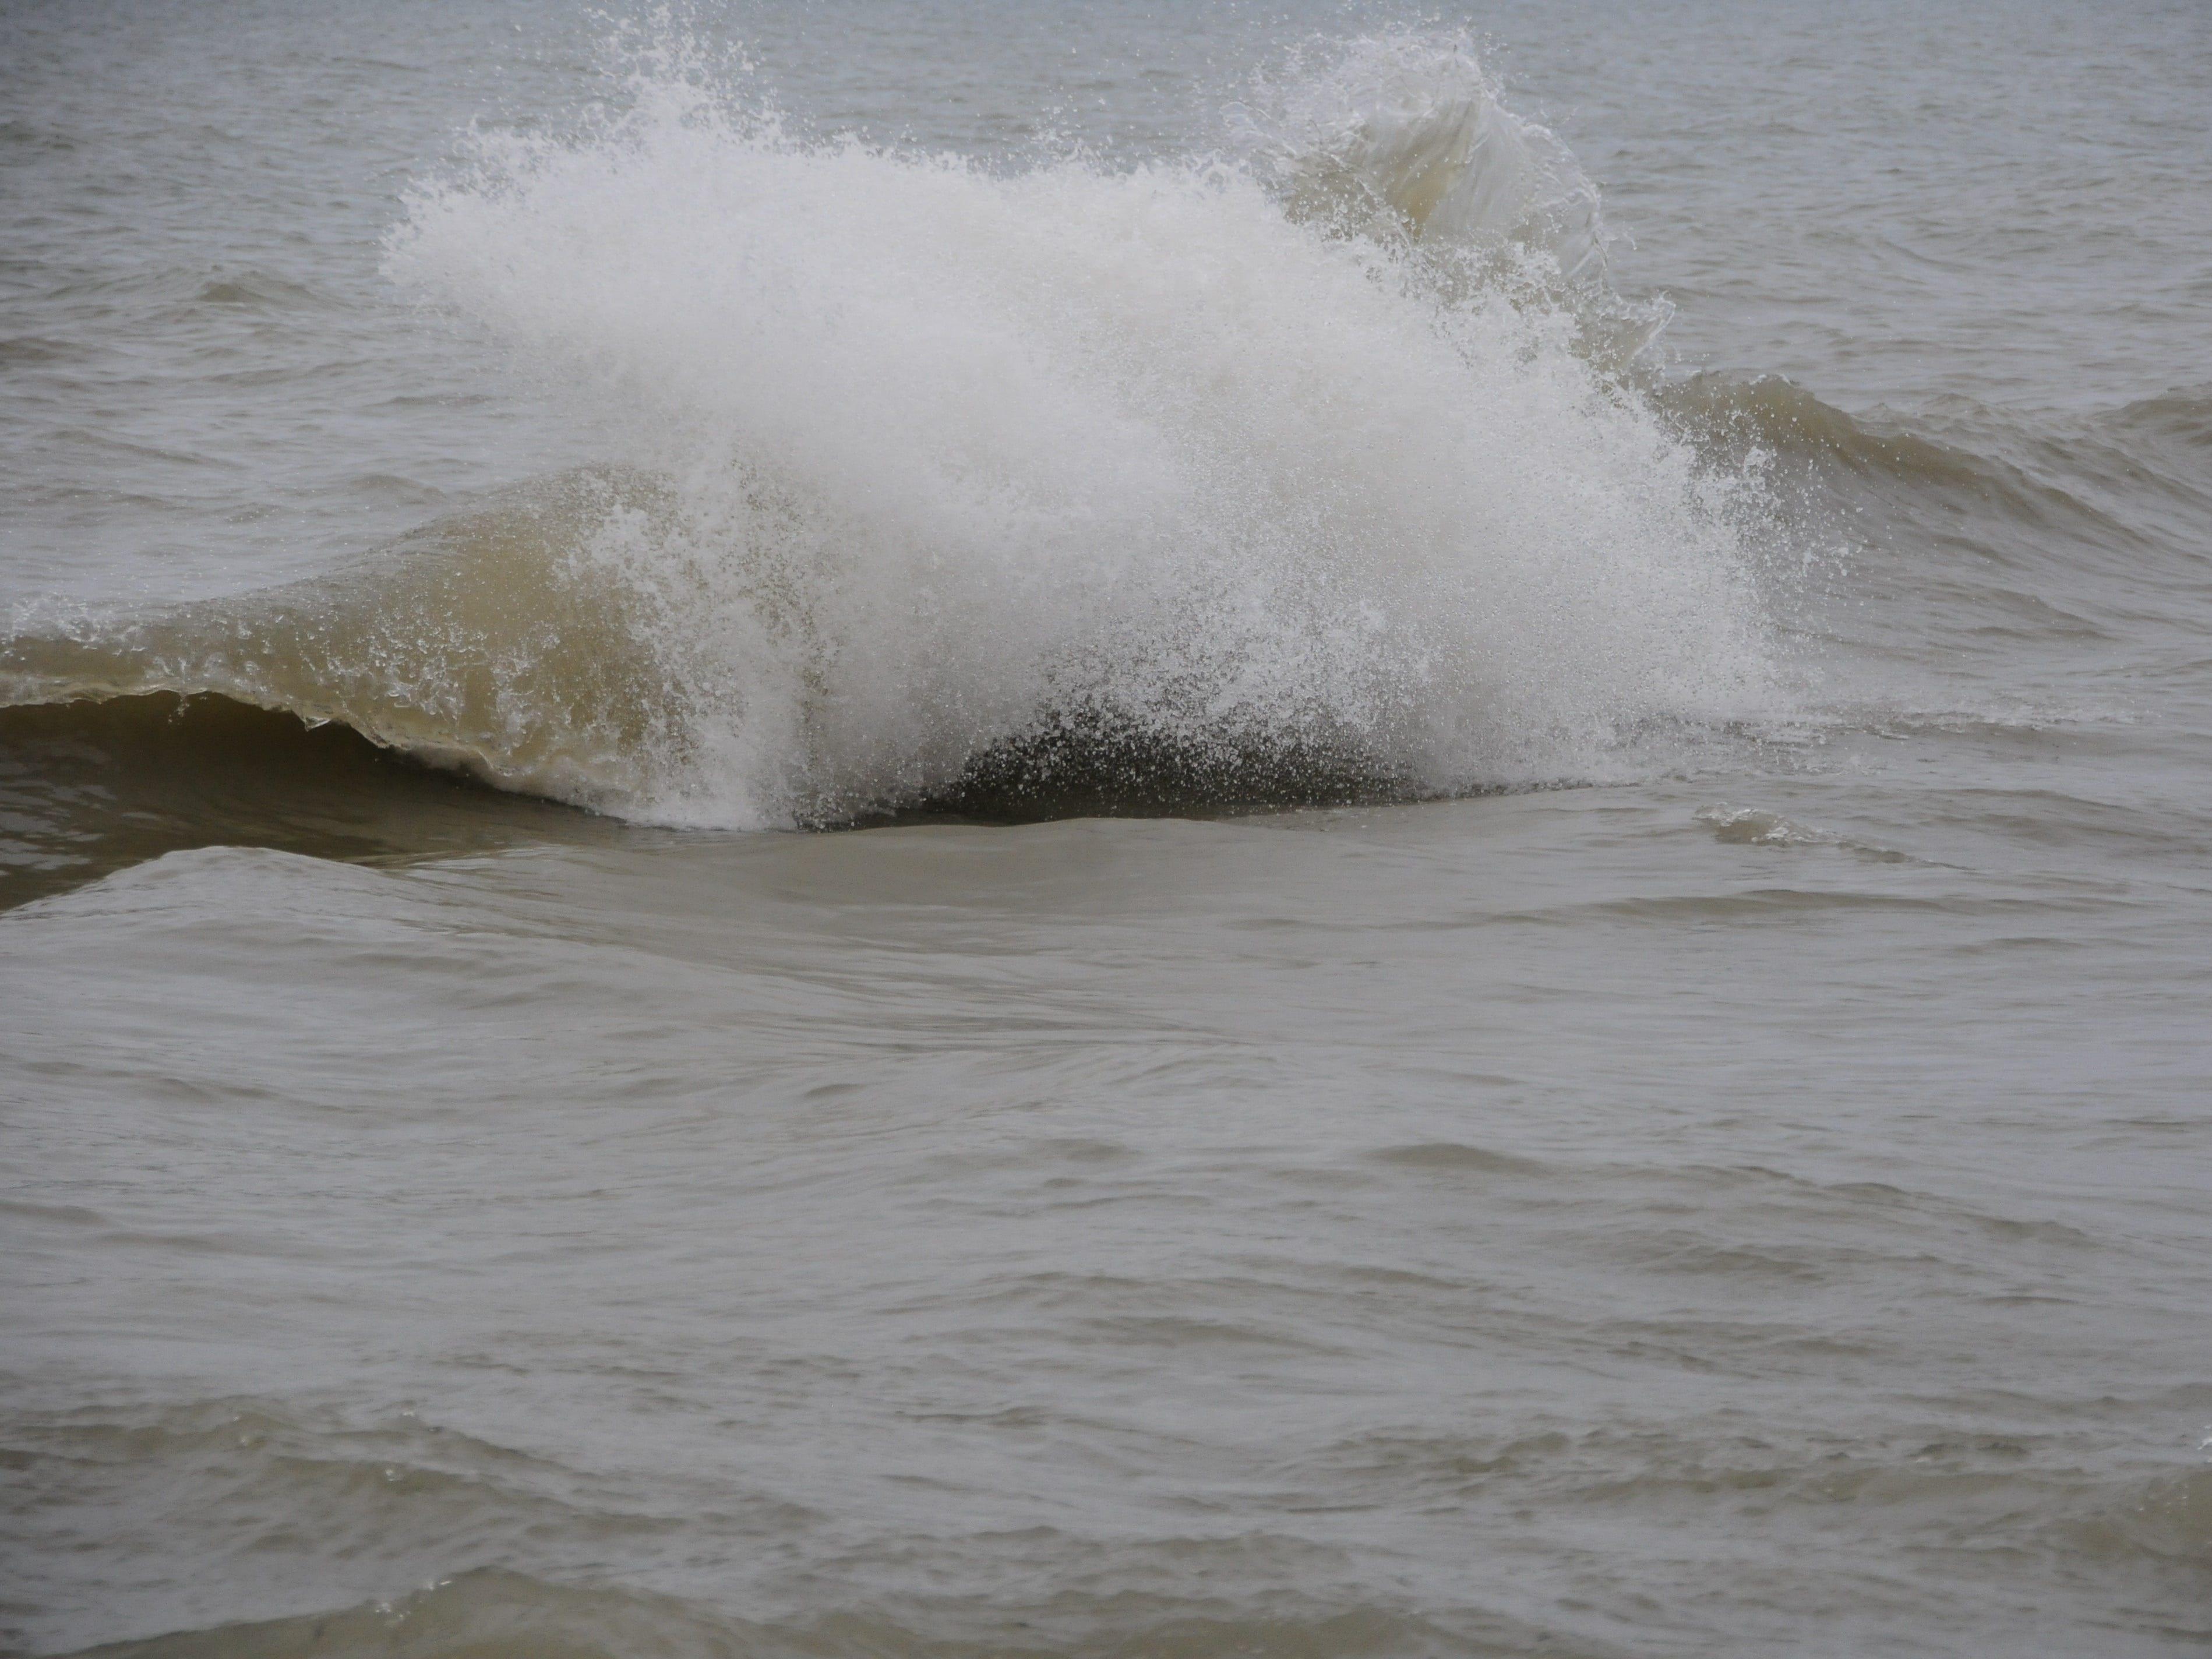 Waves roll ashore in Lake Huron near Port Sanilac on Saturday, Dec. 22, 2018.